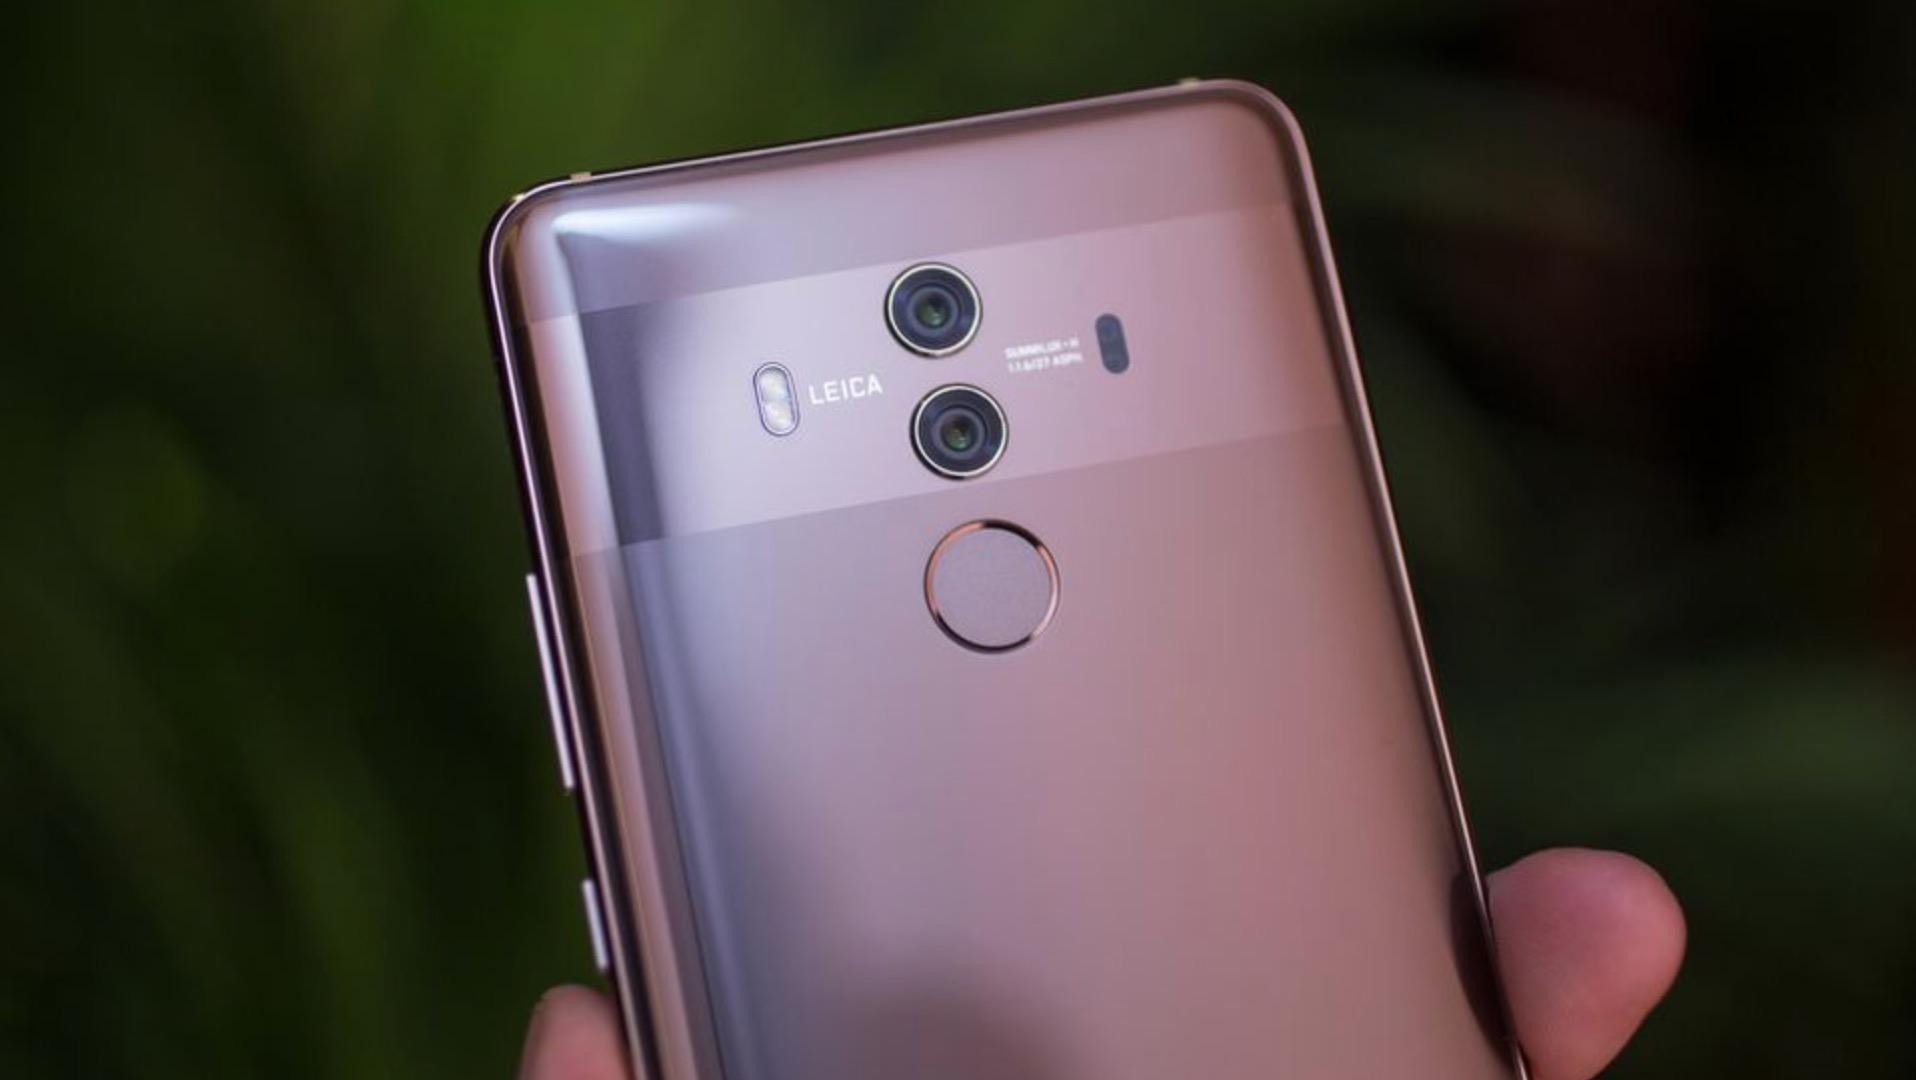 Huawei Mate 10 Pro durata batteria 4000 mAh